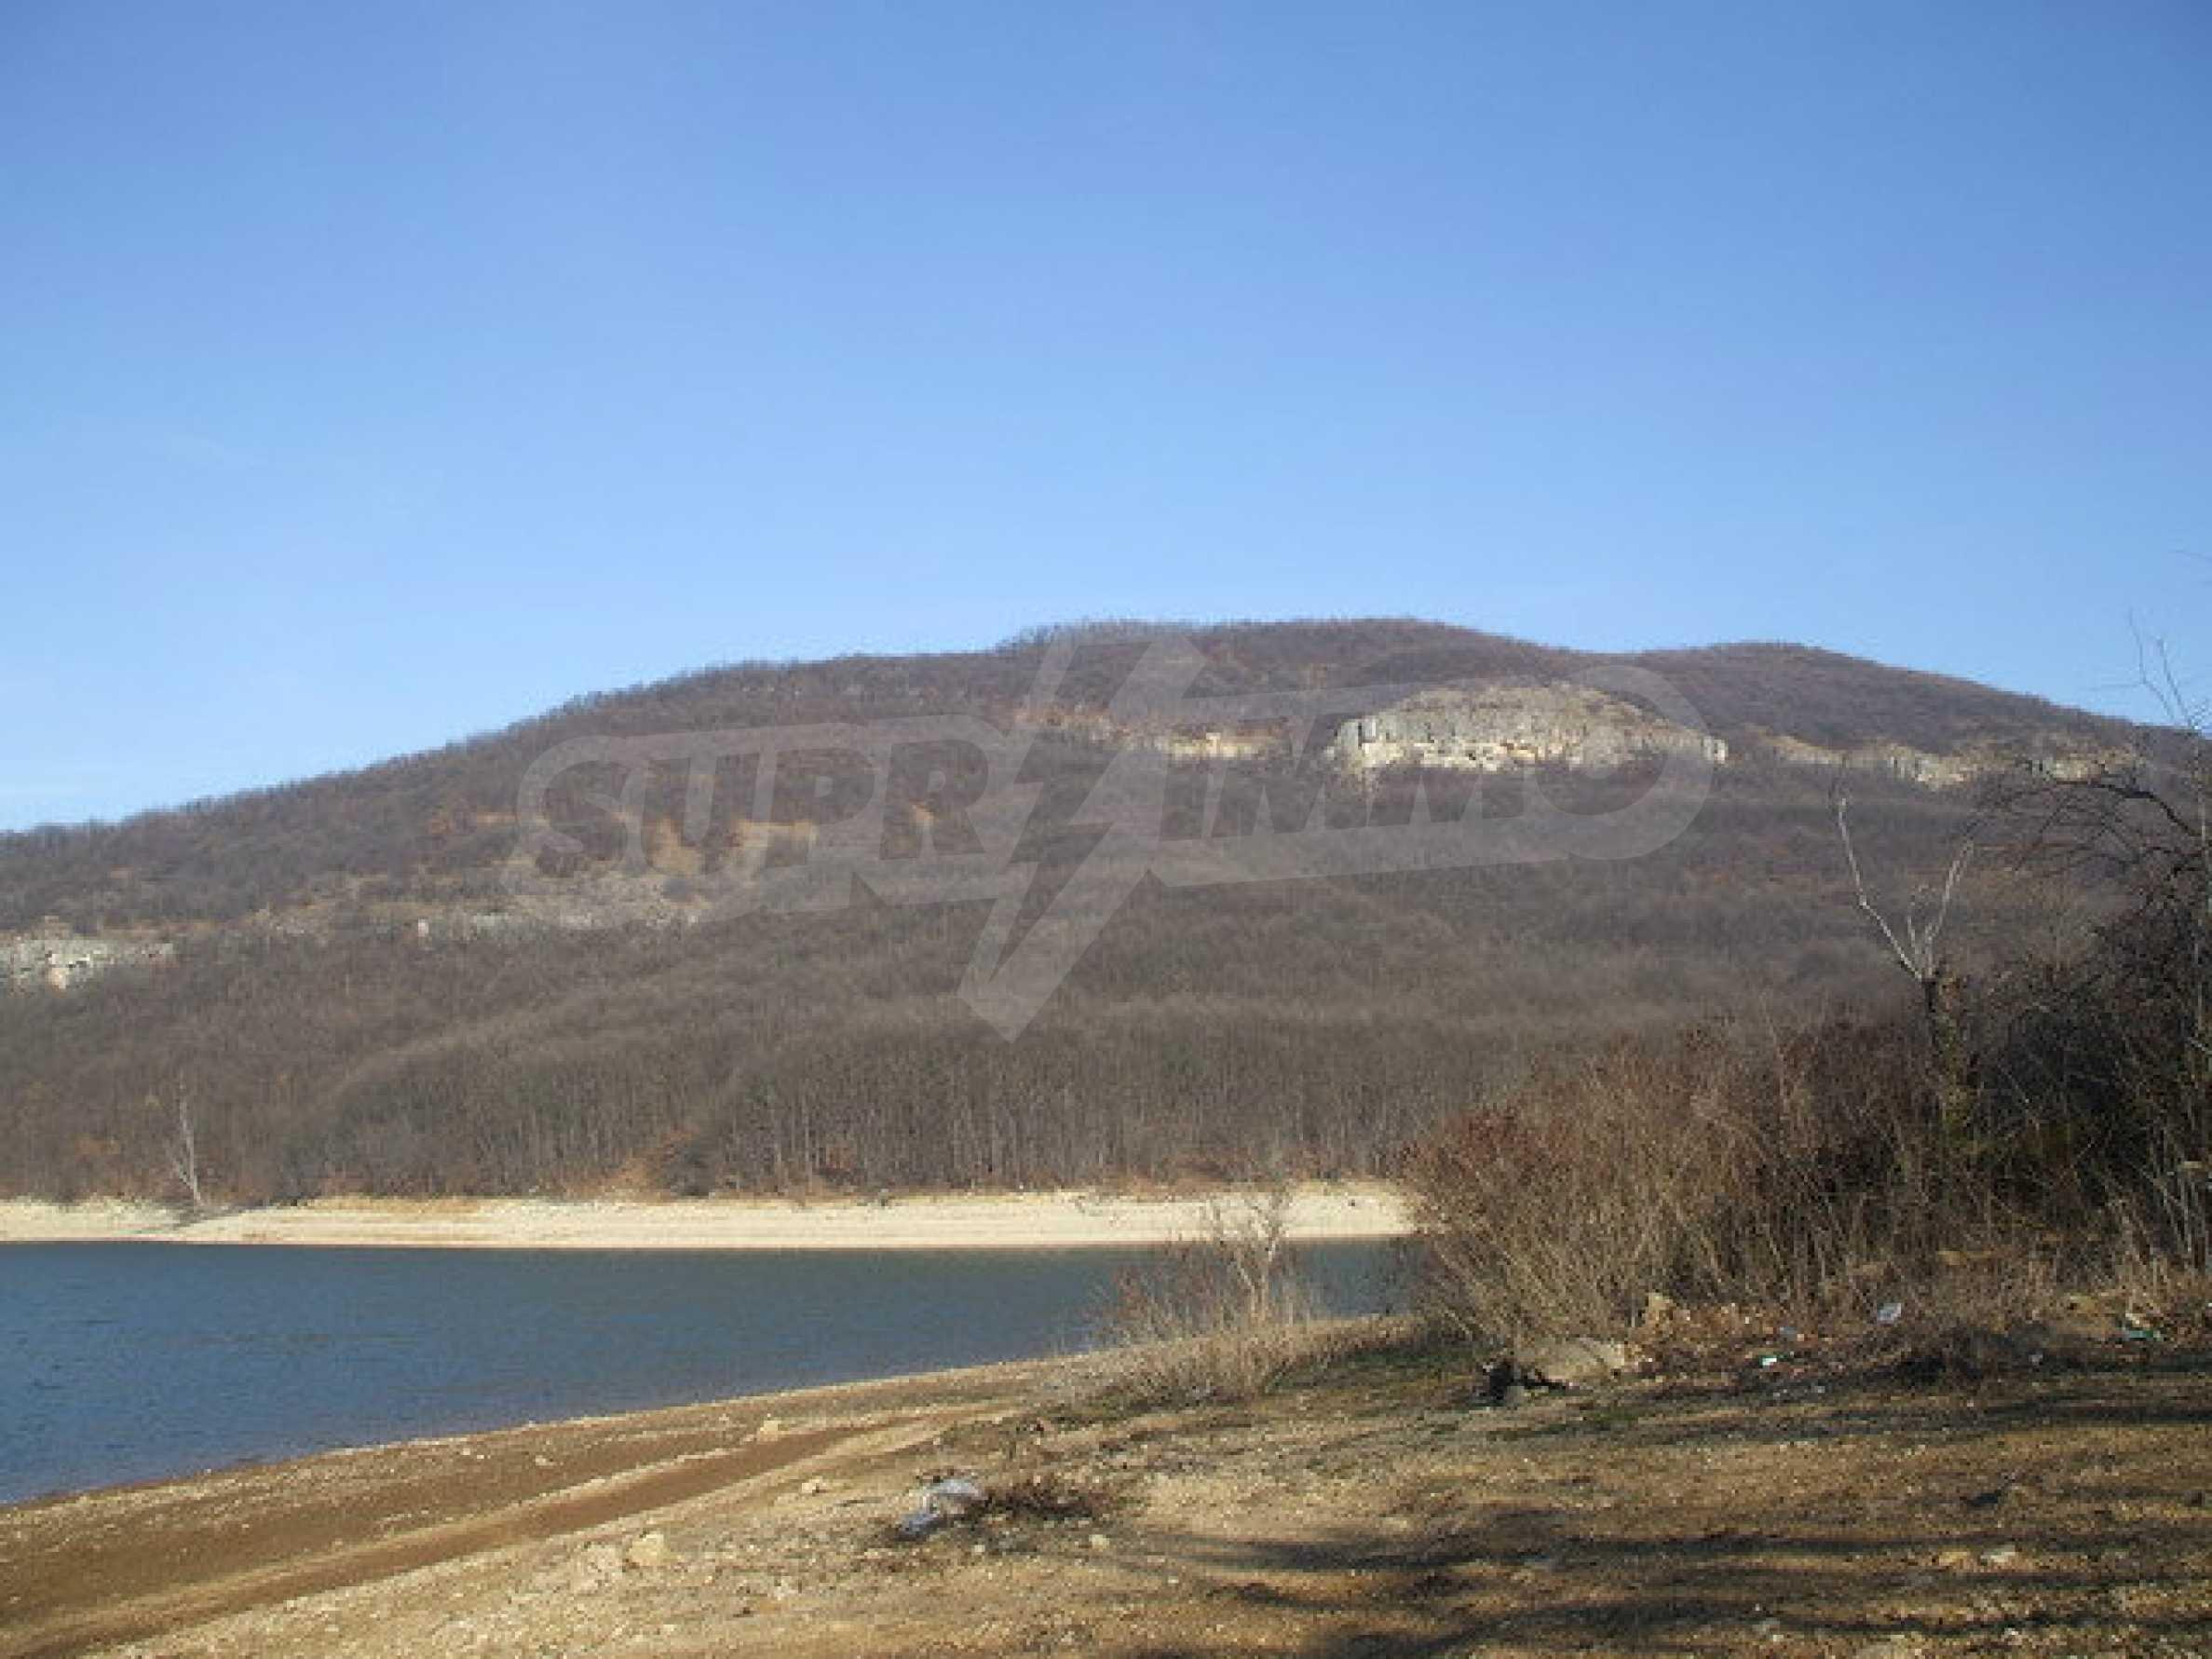 Land in regulation near Lake Alexander Stamboliyski